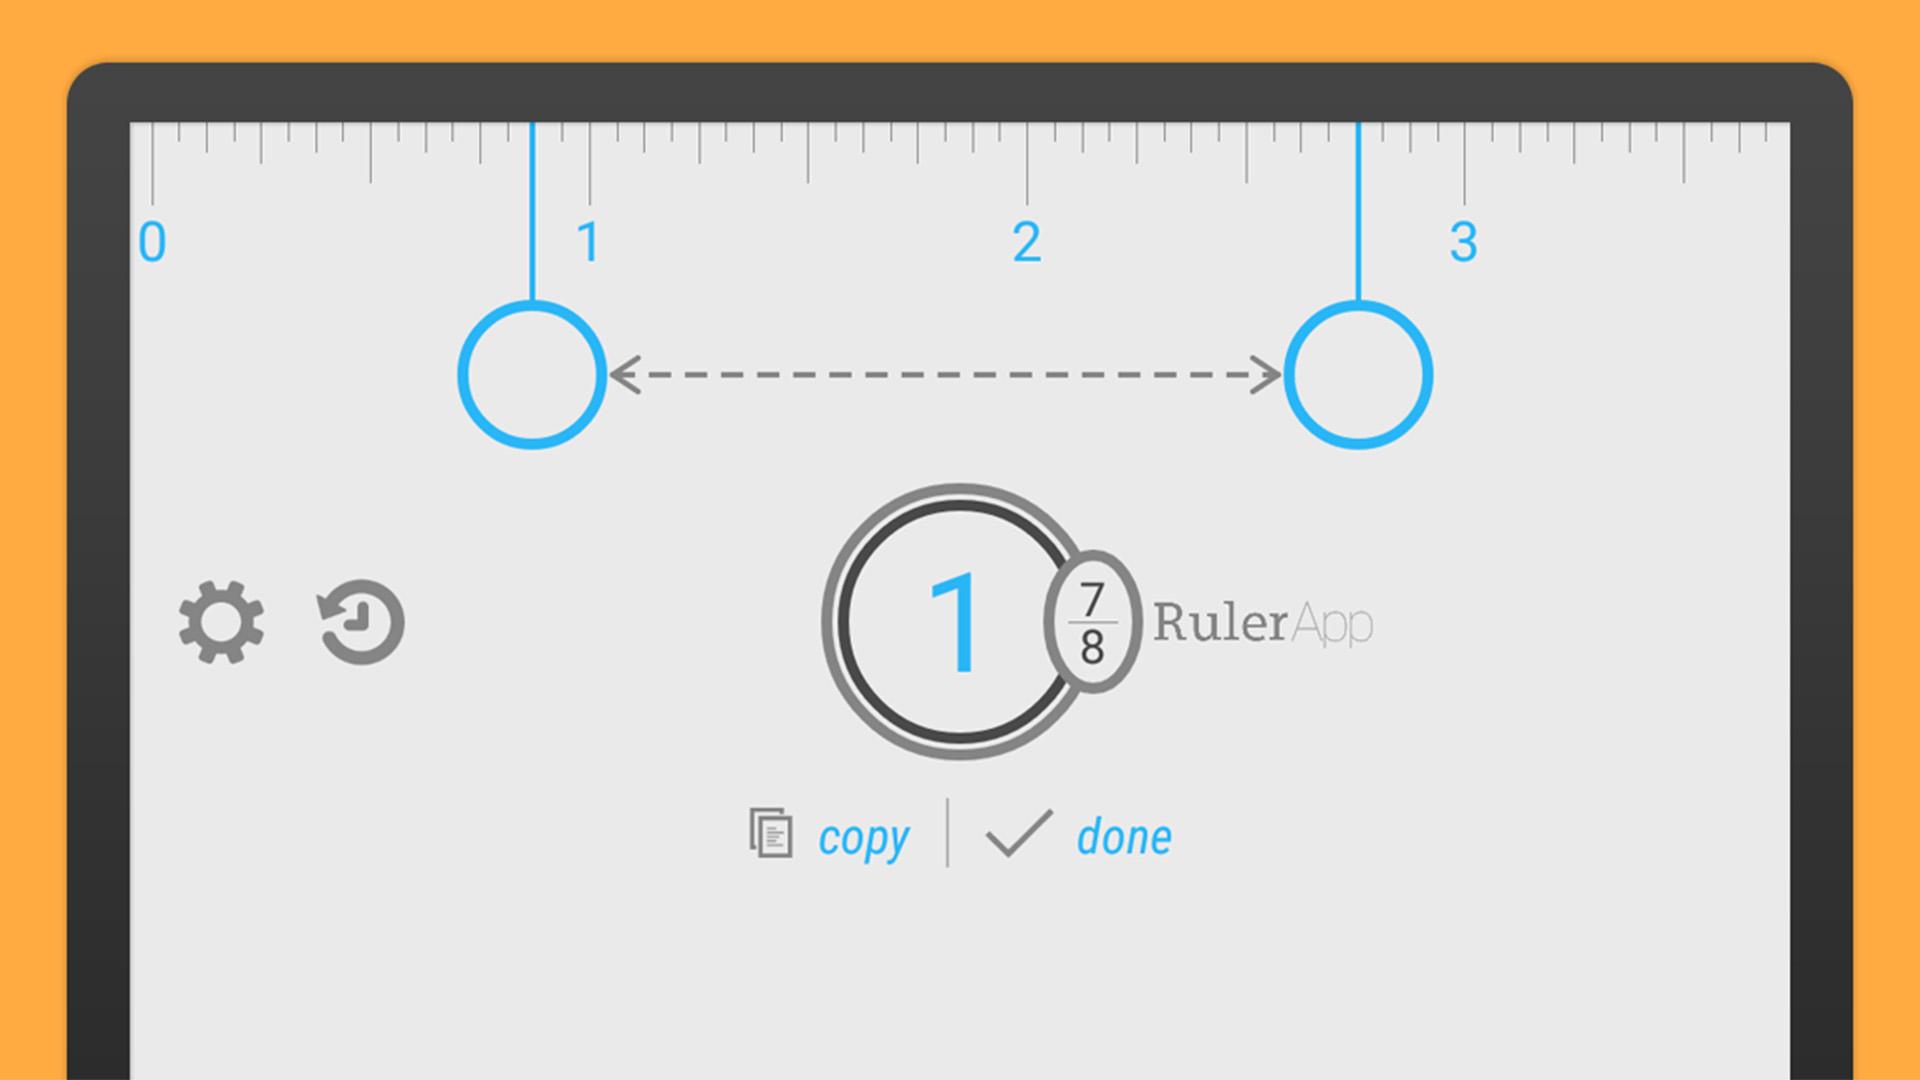 Ruler App best ruler apps for Android